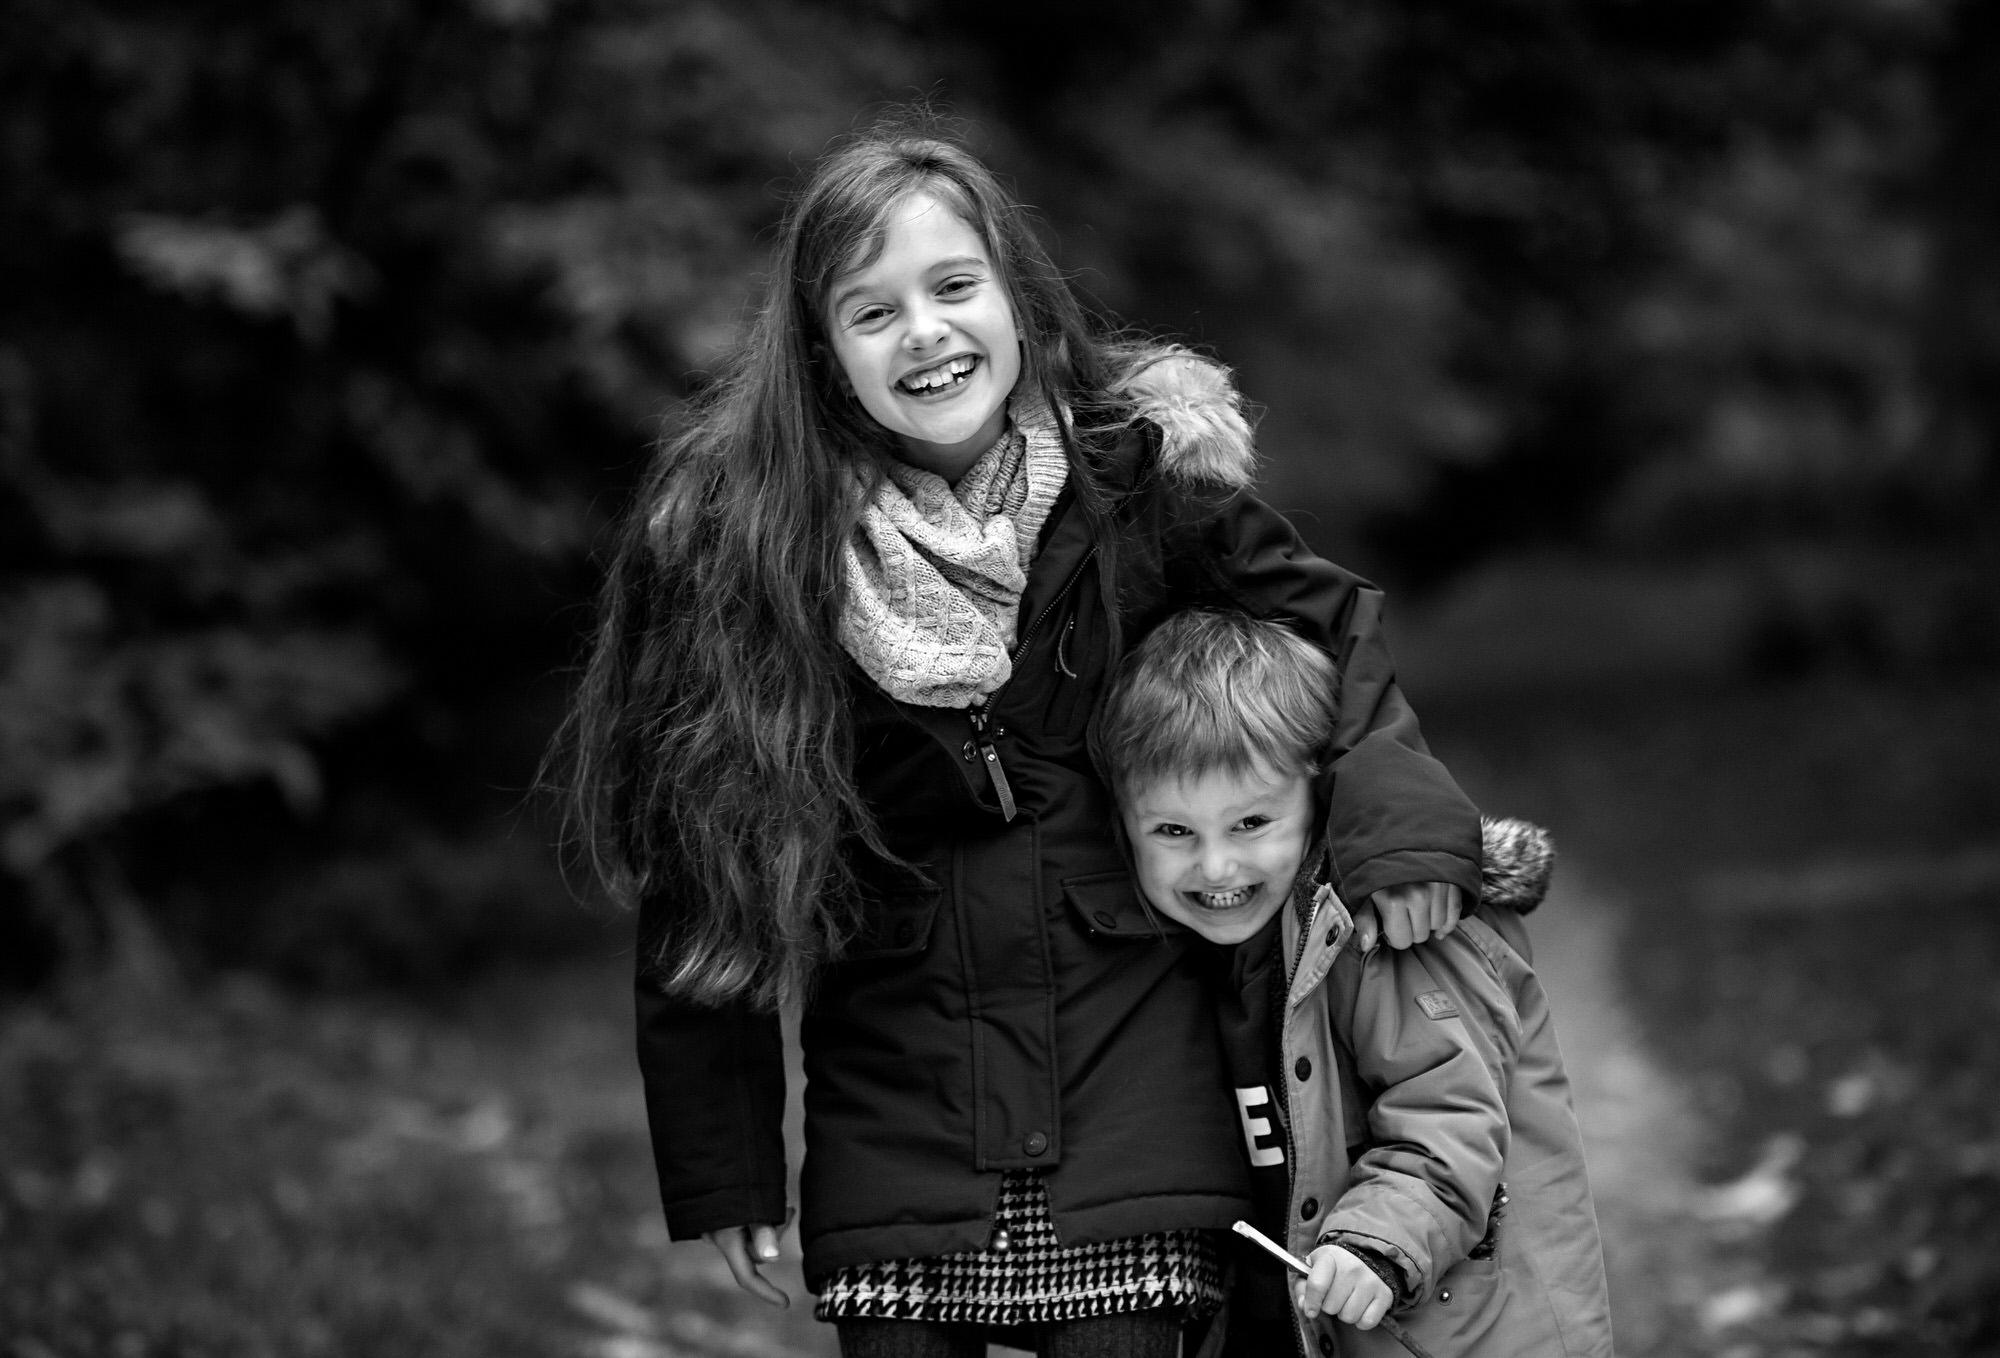 Family photoshoot outdoors, Barnsley based photographer